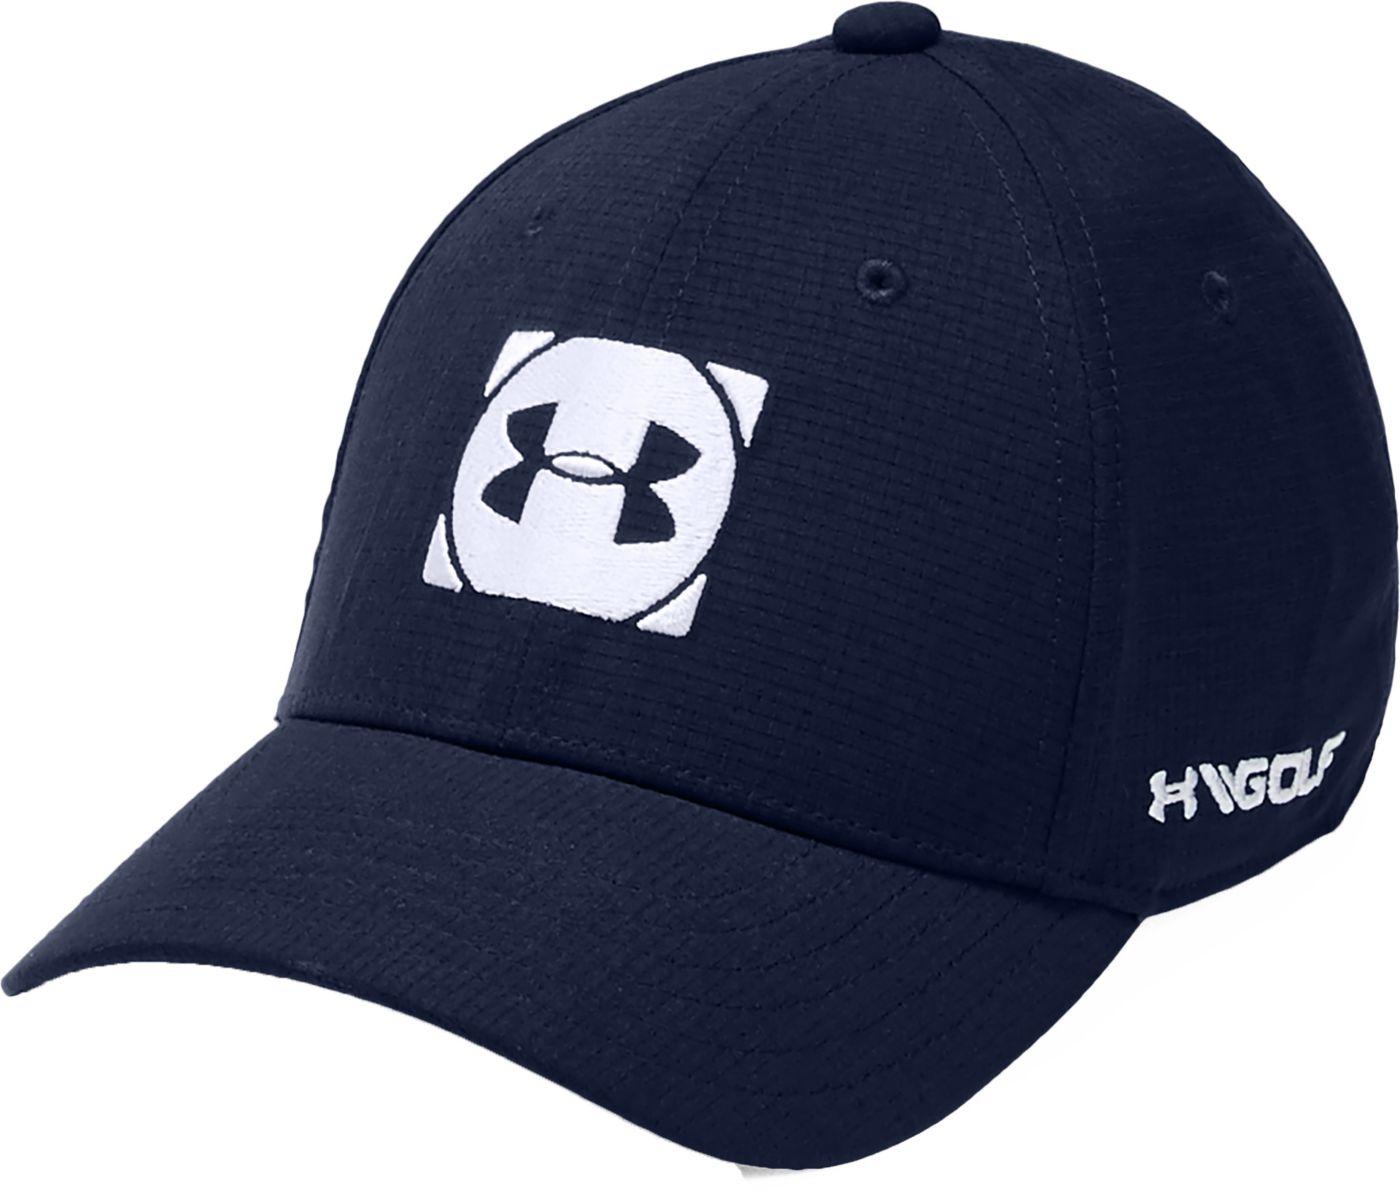 Under Armour Boys' Official Tour 3.0 Golf Hat